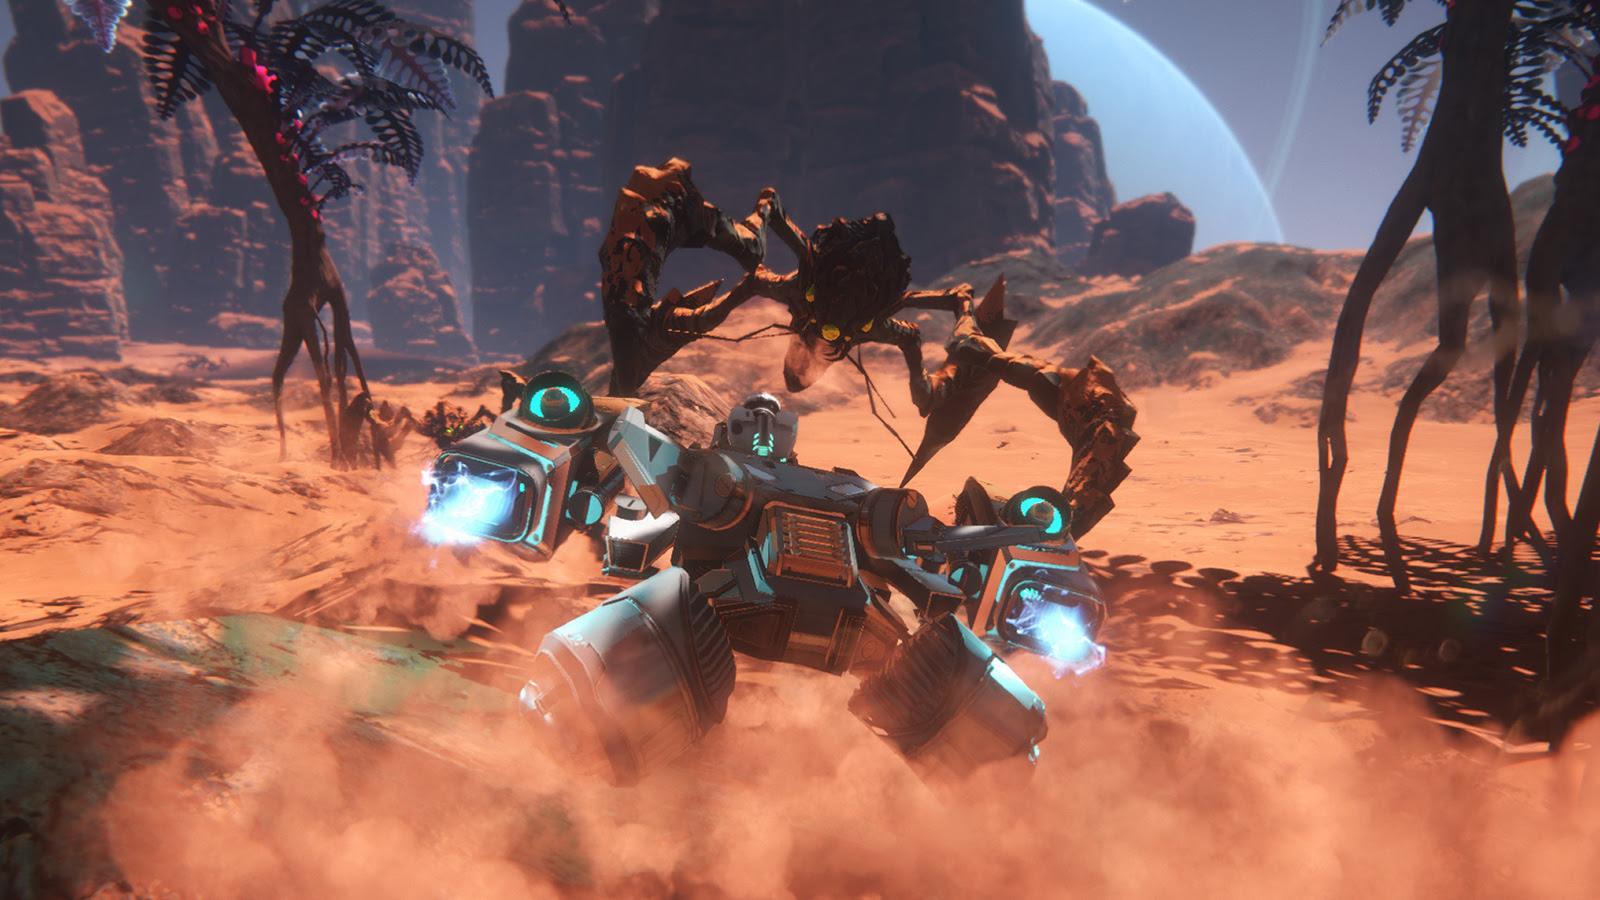 Space-faring survival game Osiris: New Dawn tops the Steam charts screenshot